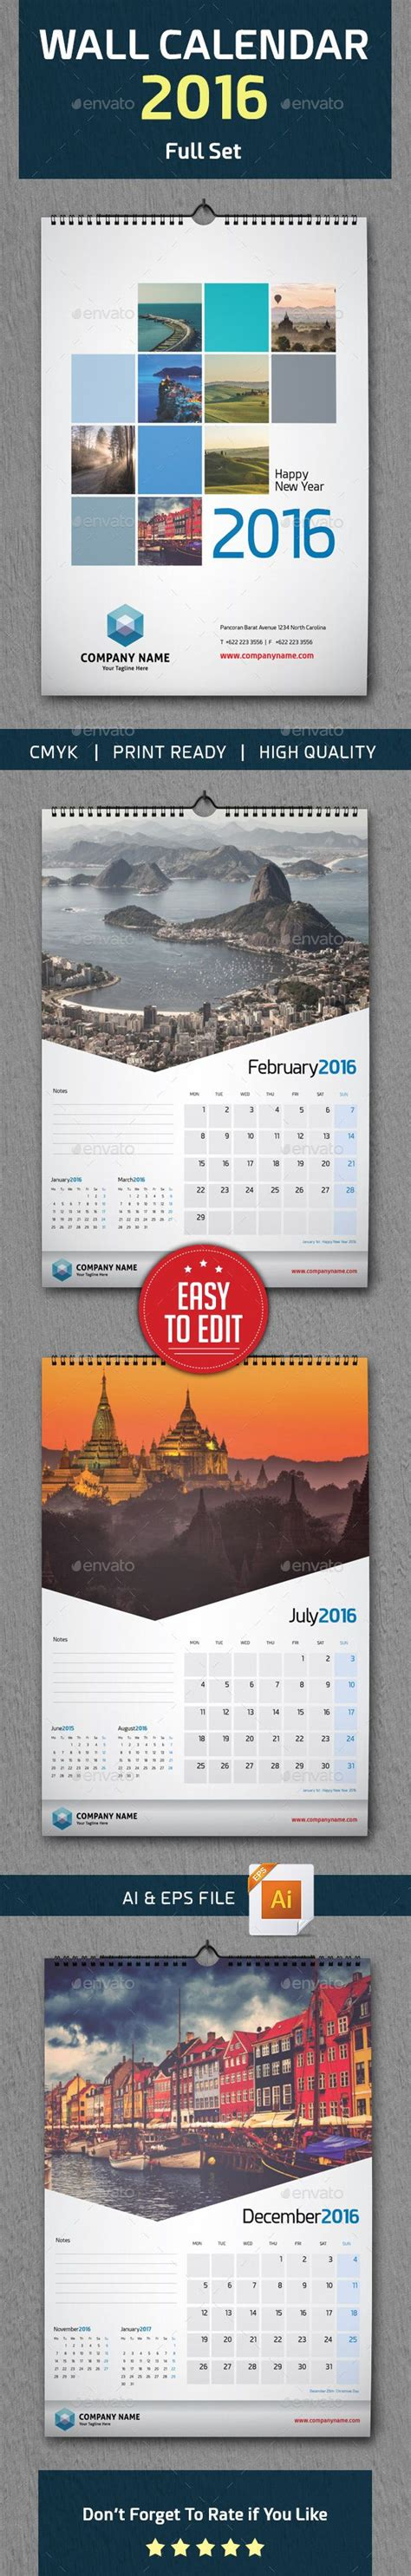 table calendar design layout 11 best corporate calendar design images on pinterest